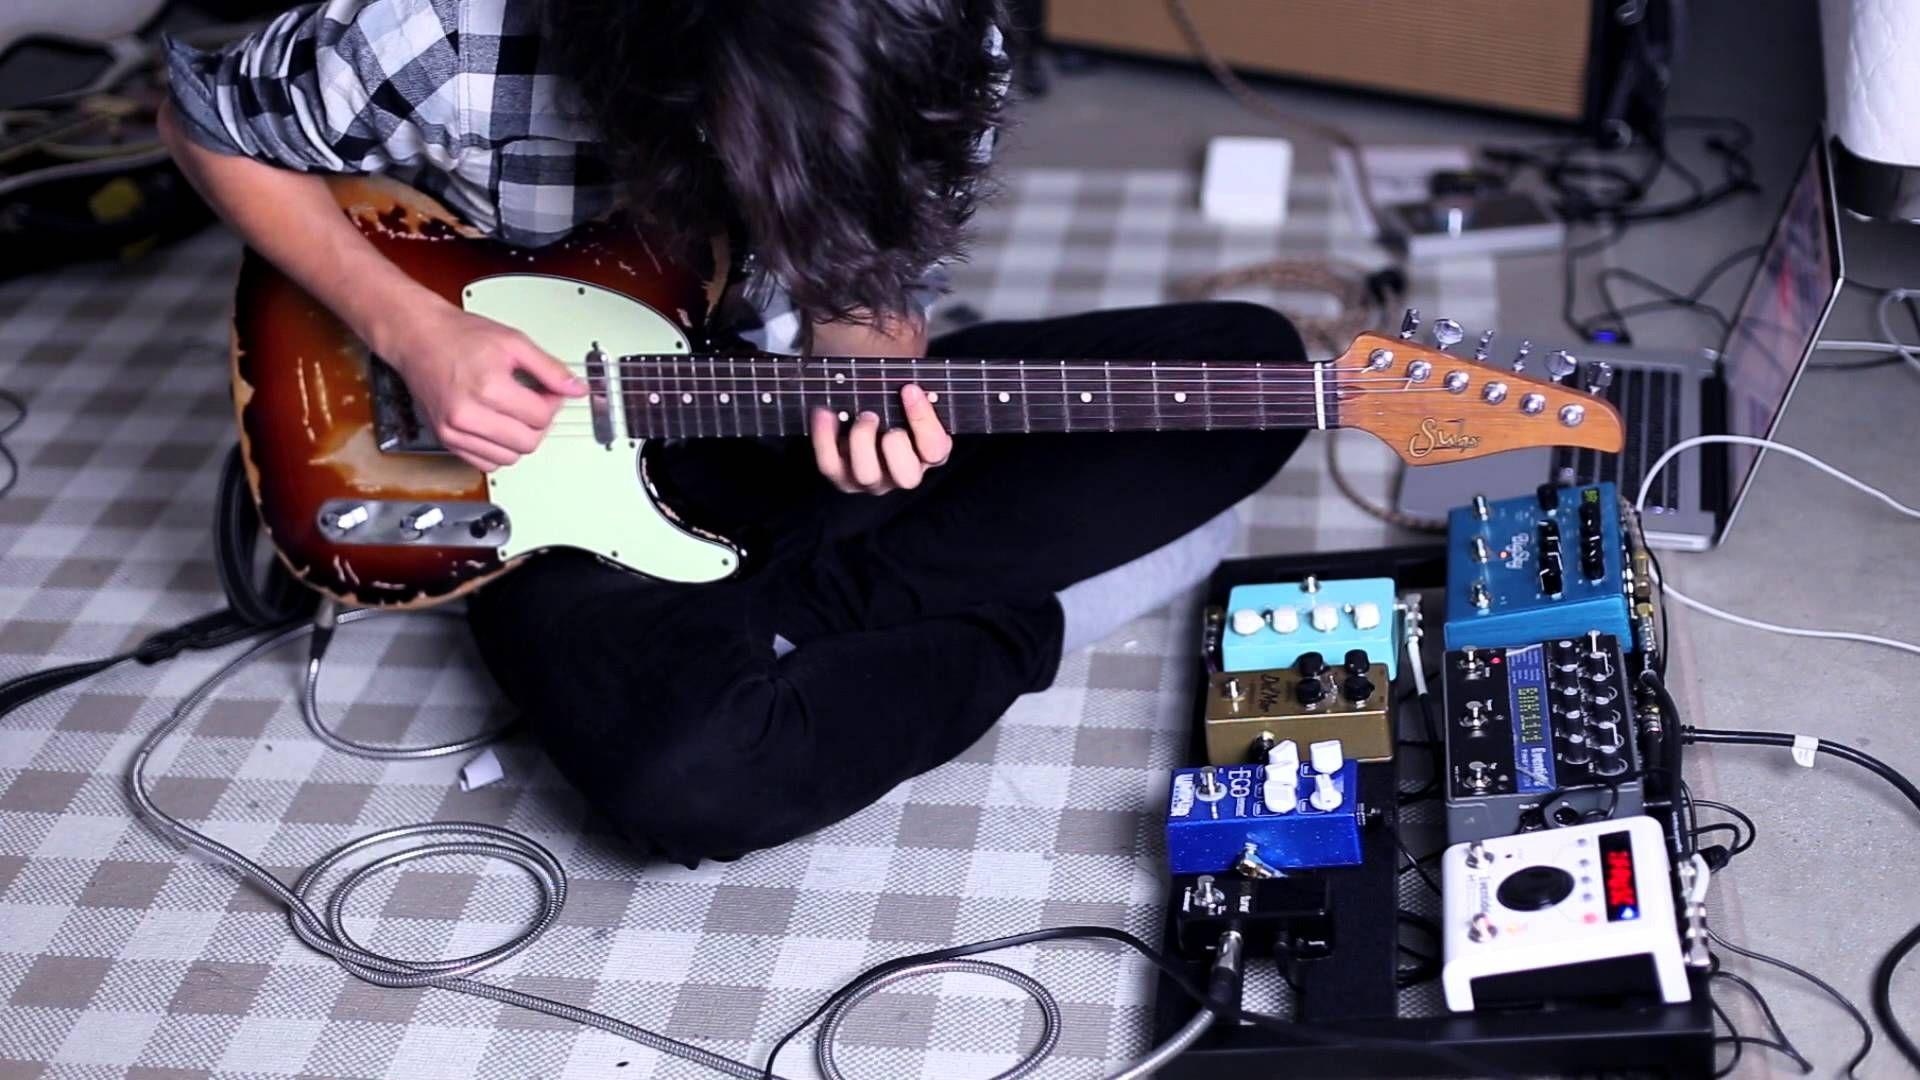 mateus asato de si guitars pinterest messy room and guitars